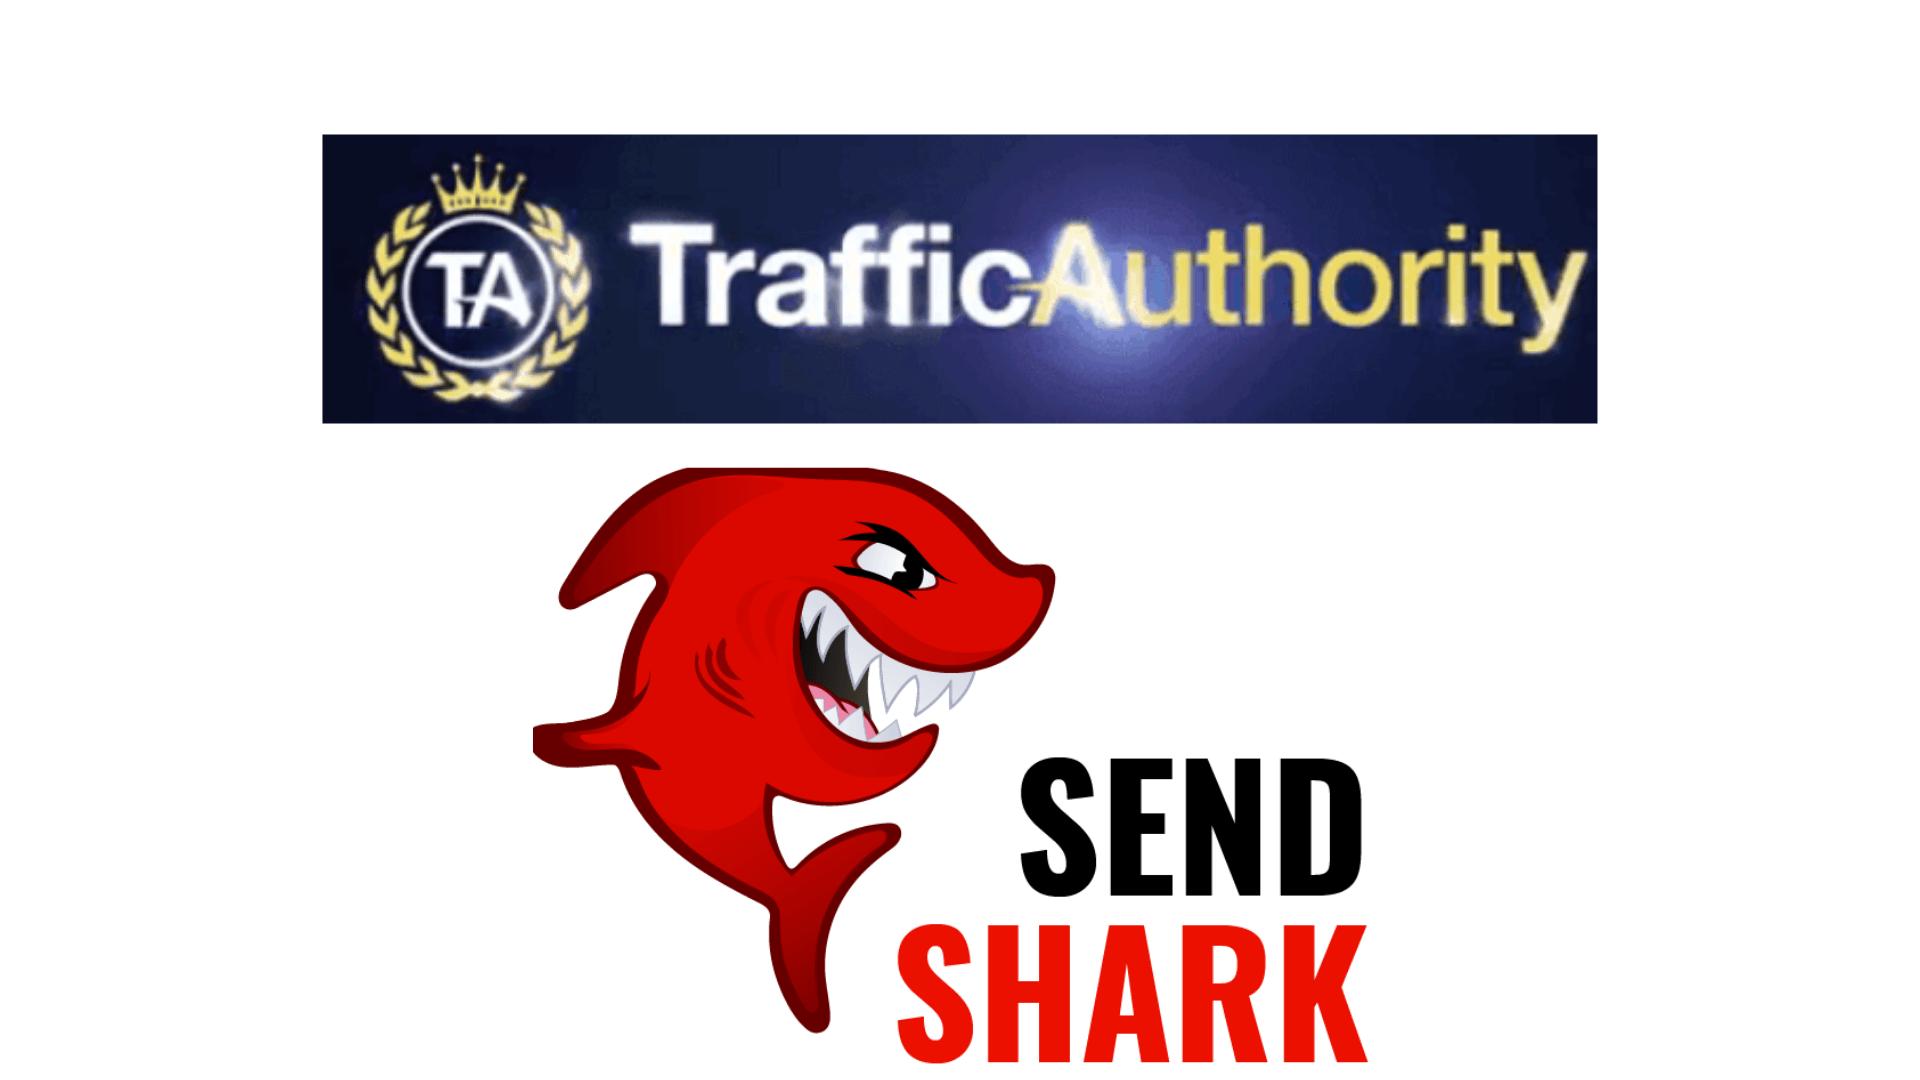 List Leverage - Send Shark Traffic Authority